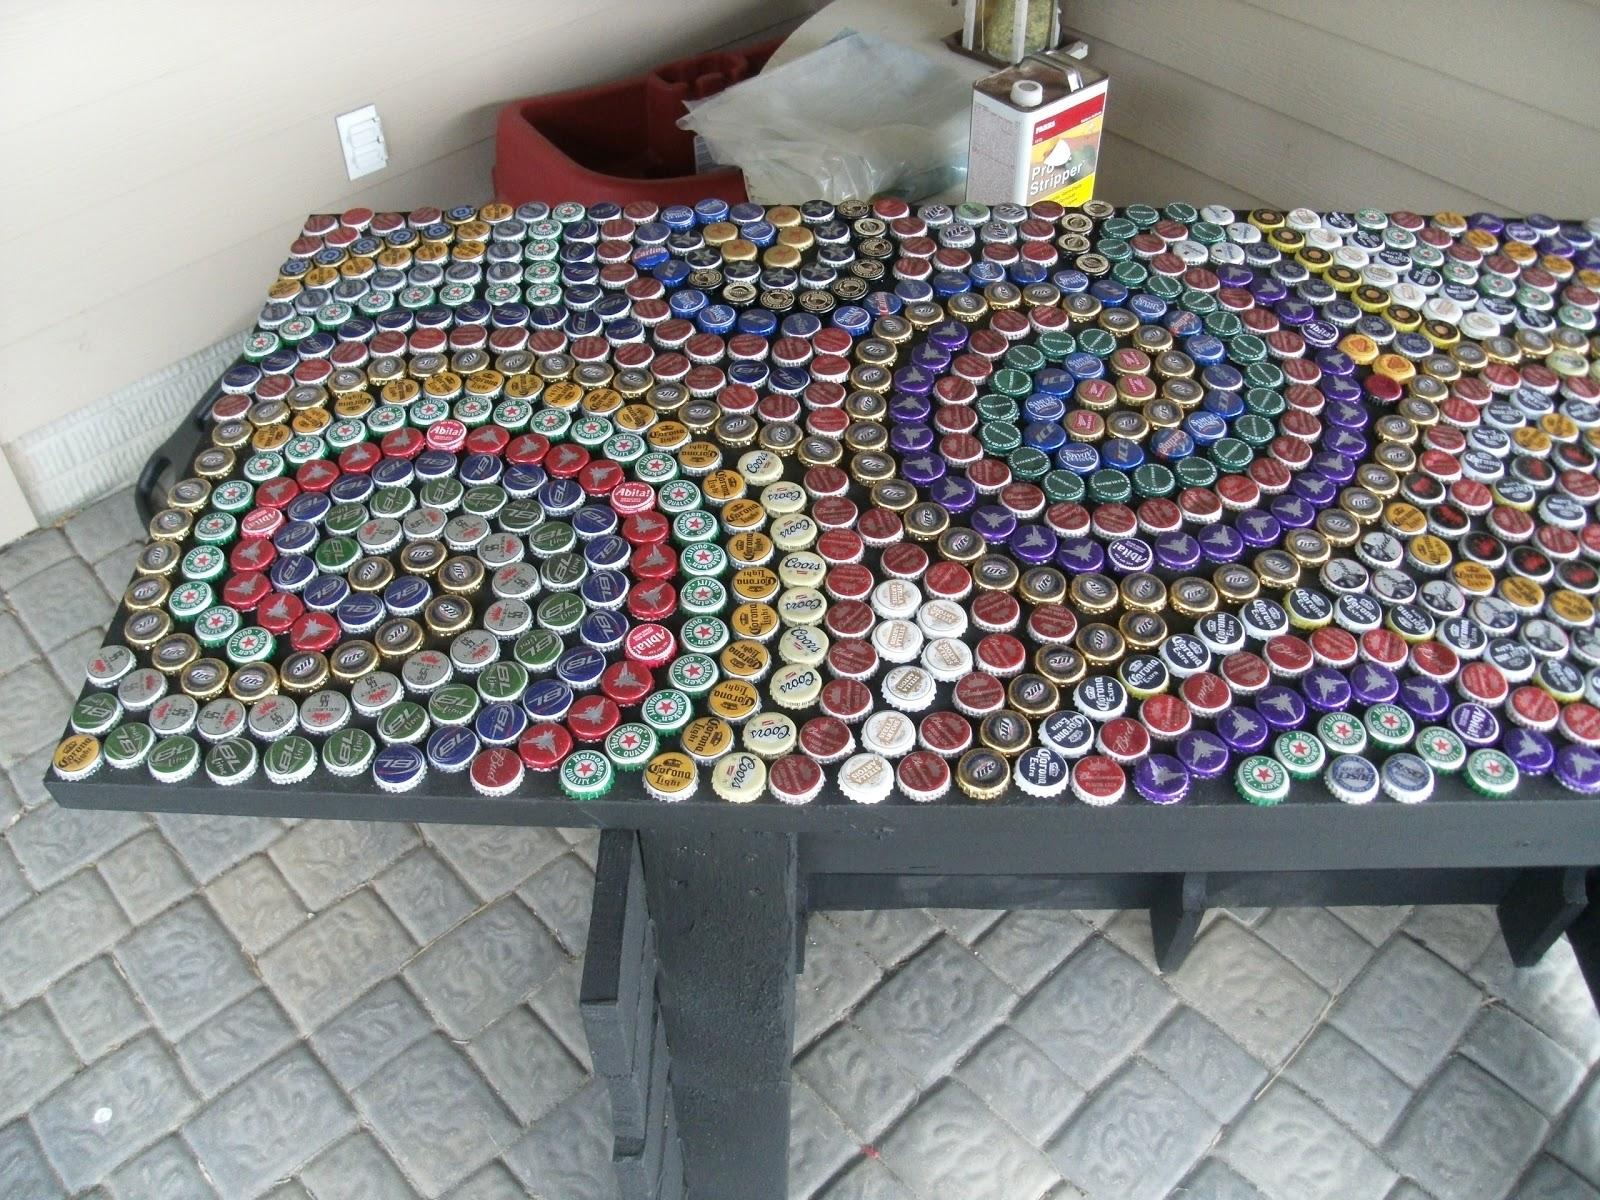 My Art/Projects: bottle cap countertop